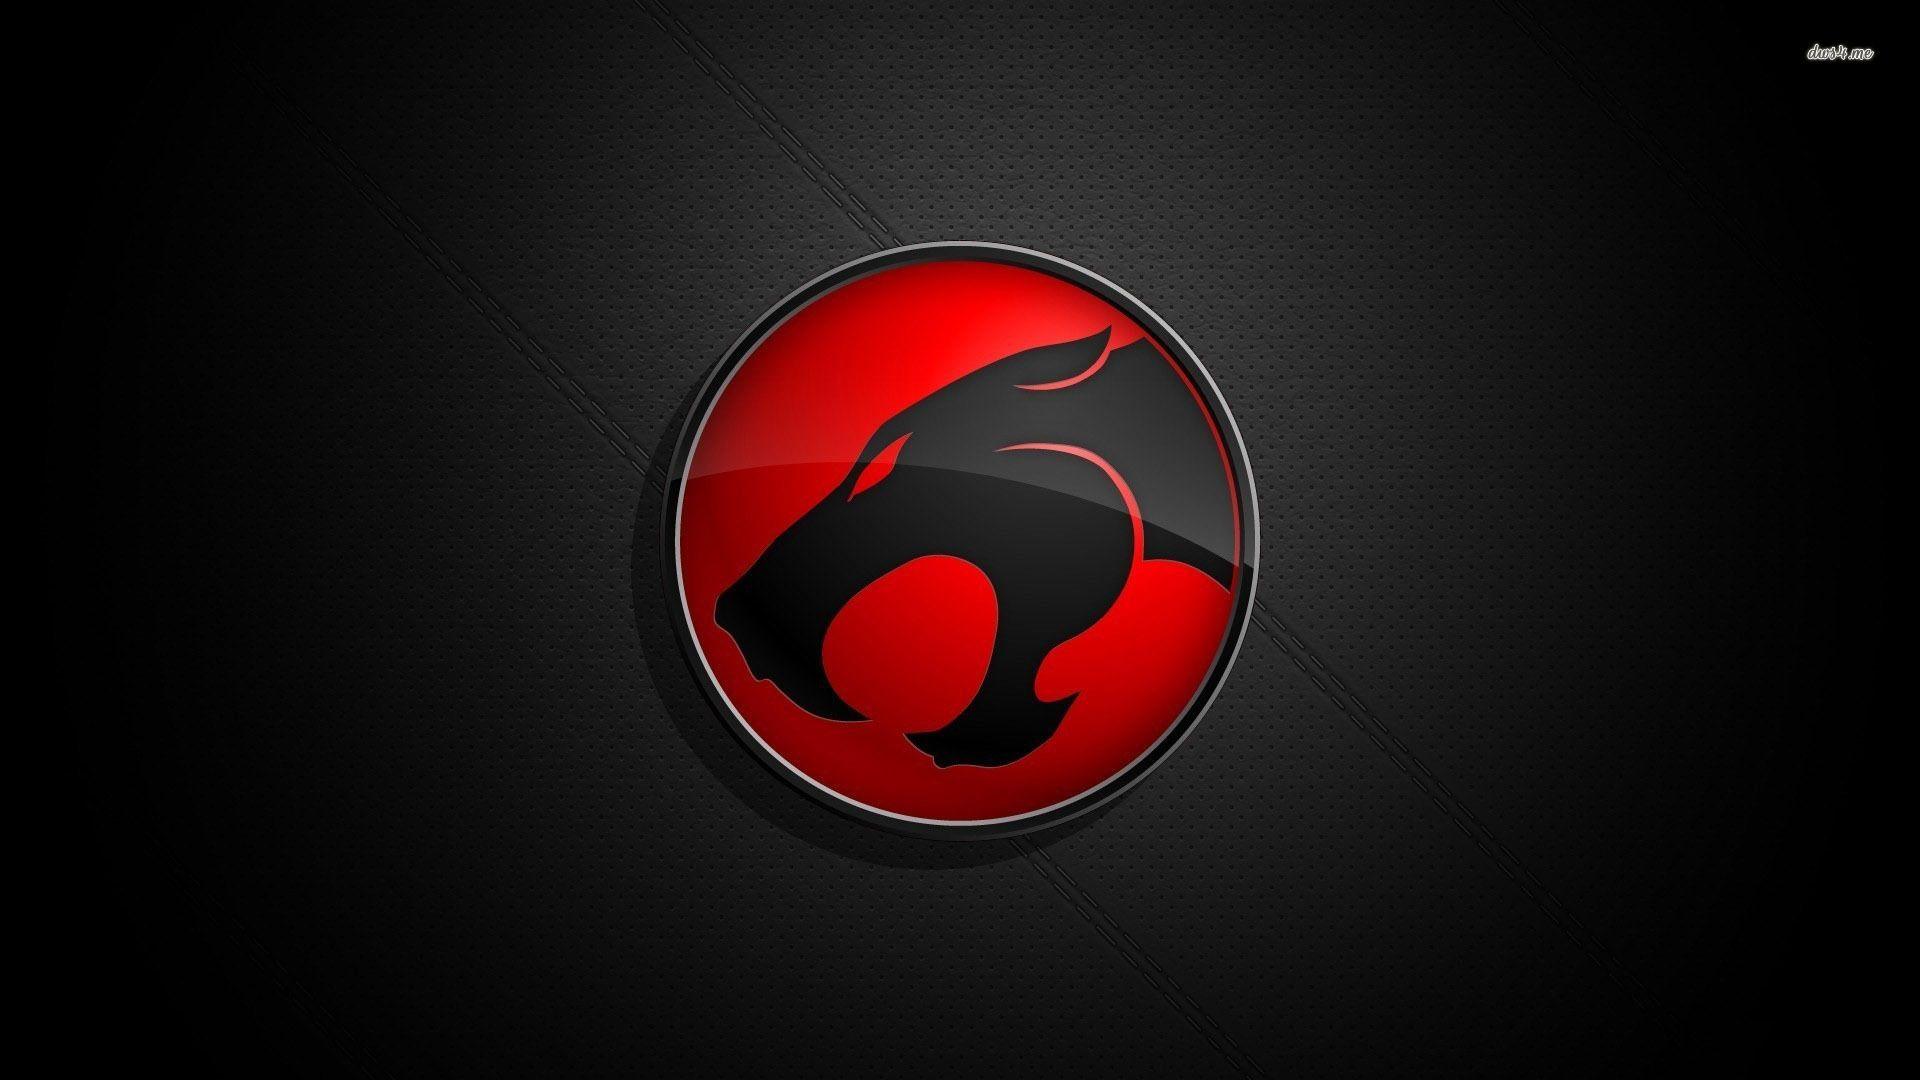 Thundercats Hd Wallpaper Logo Background Logo Wallpaper Hd Cool Logo